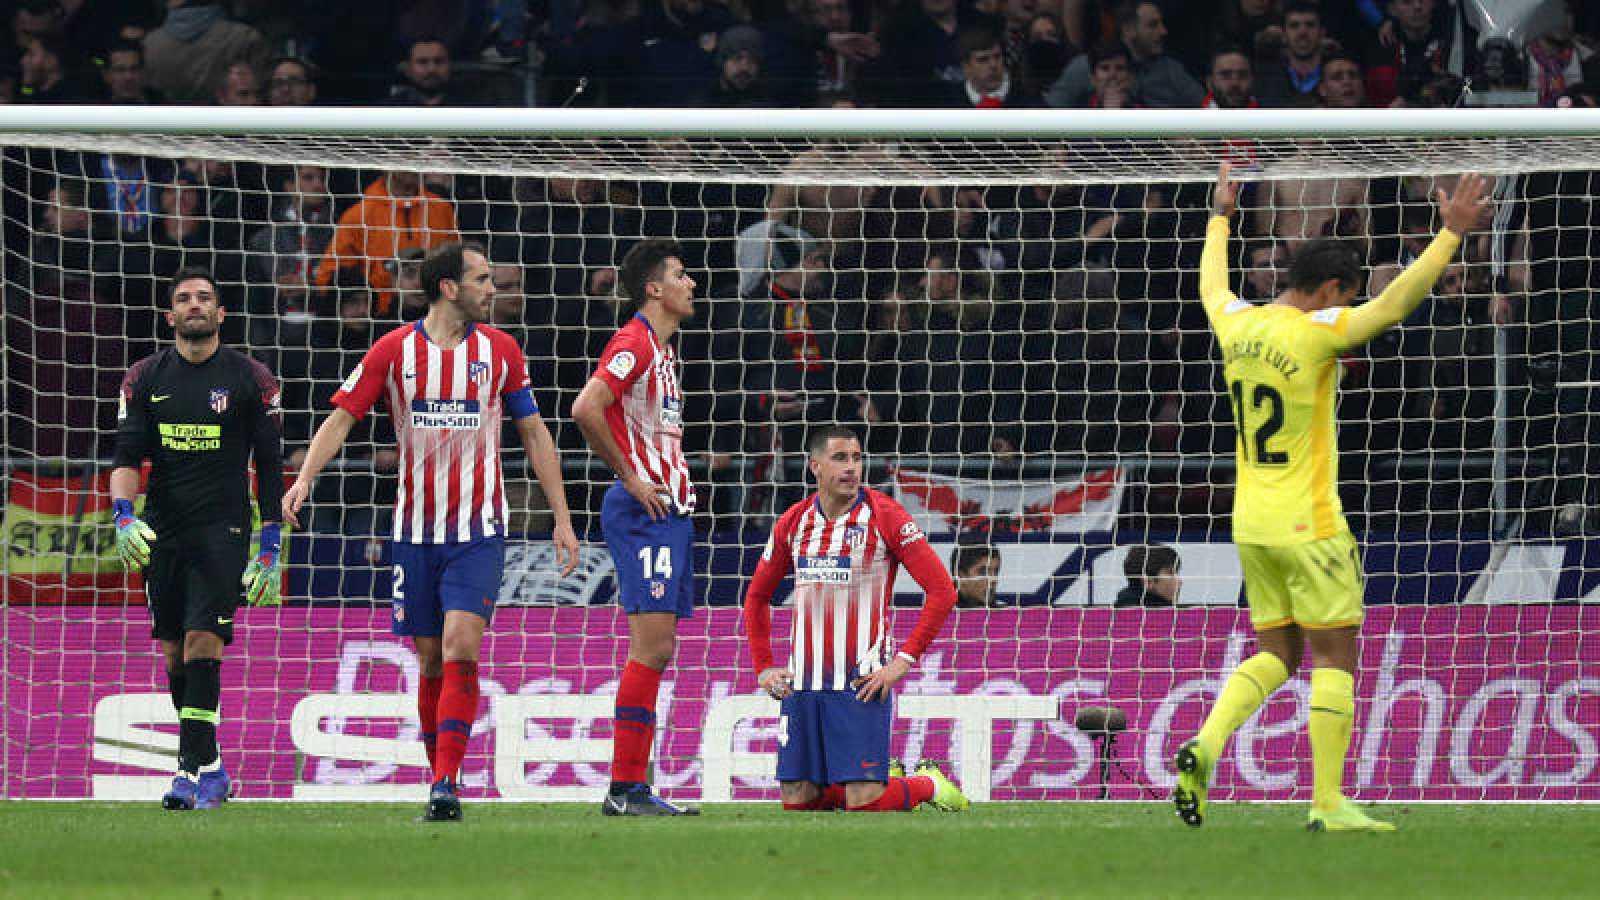 Copa del Rey - Round of 16 - Second Leg - Atletico Madrid v Girona